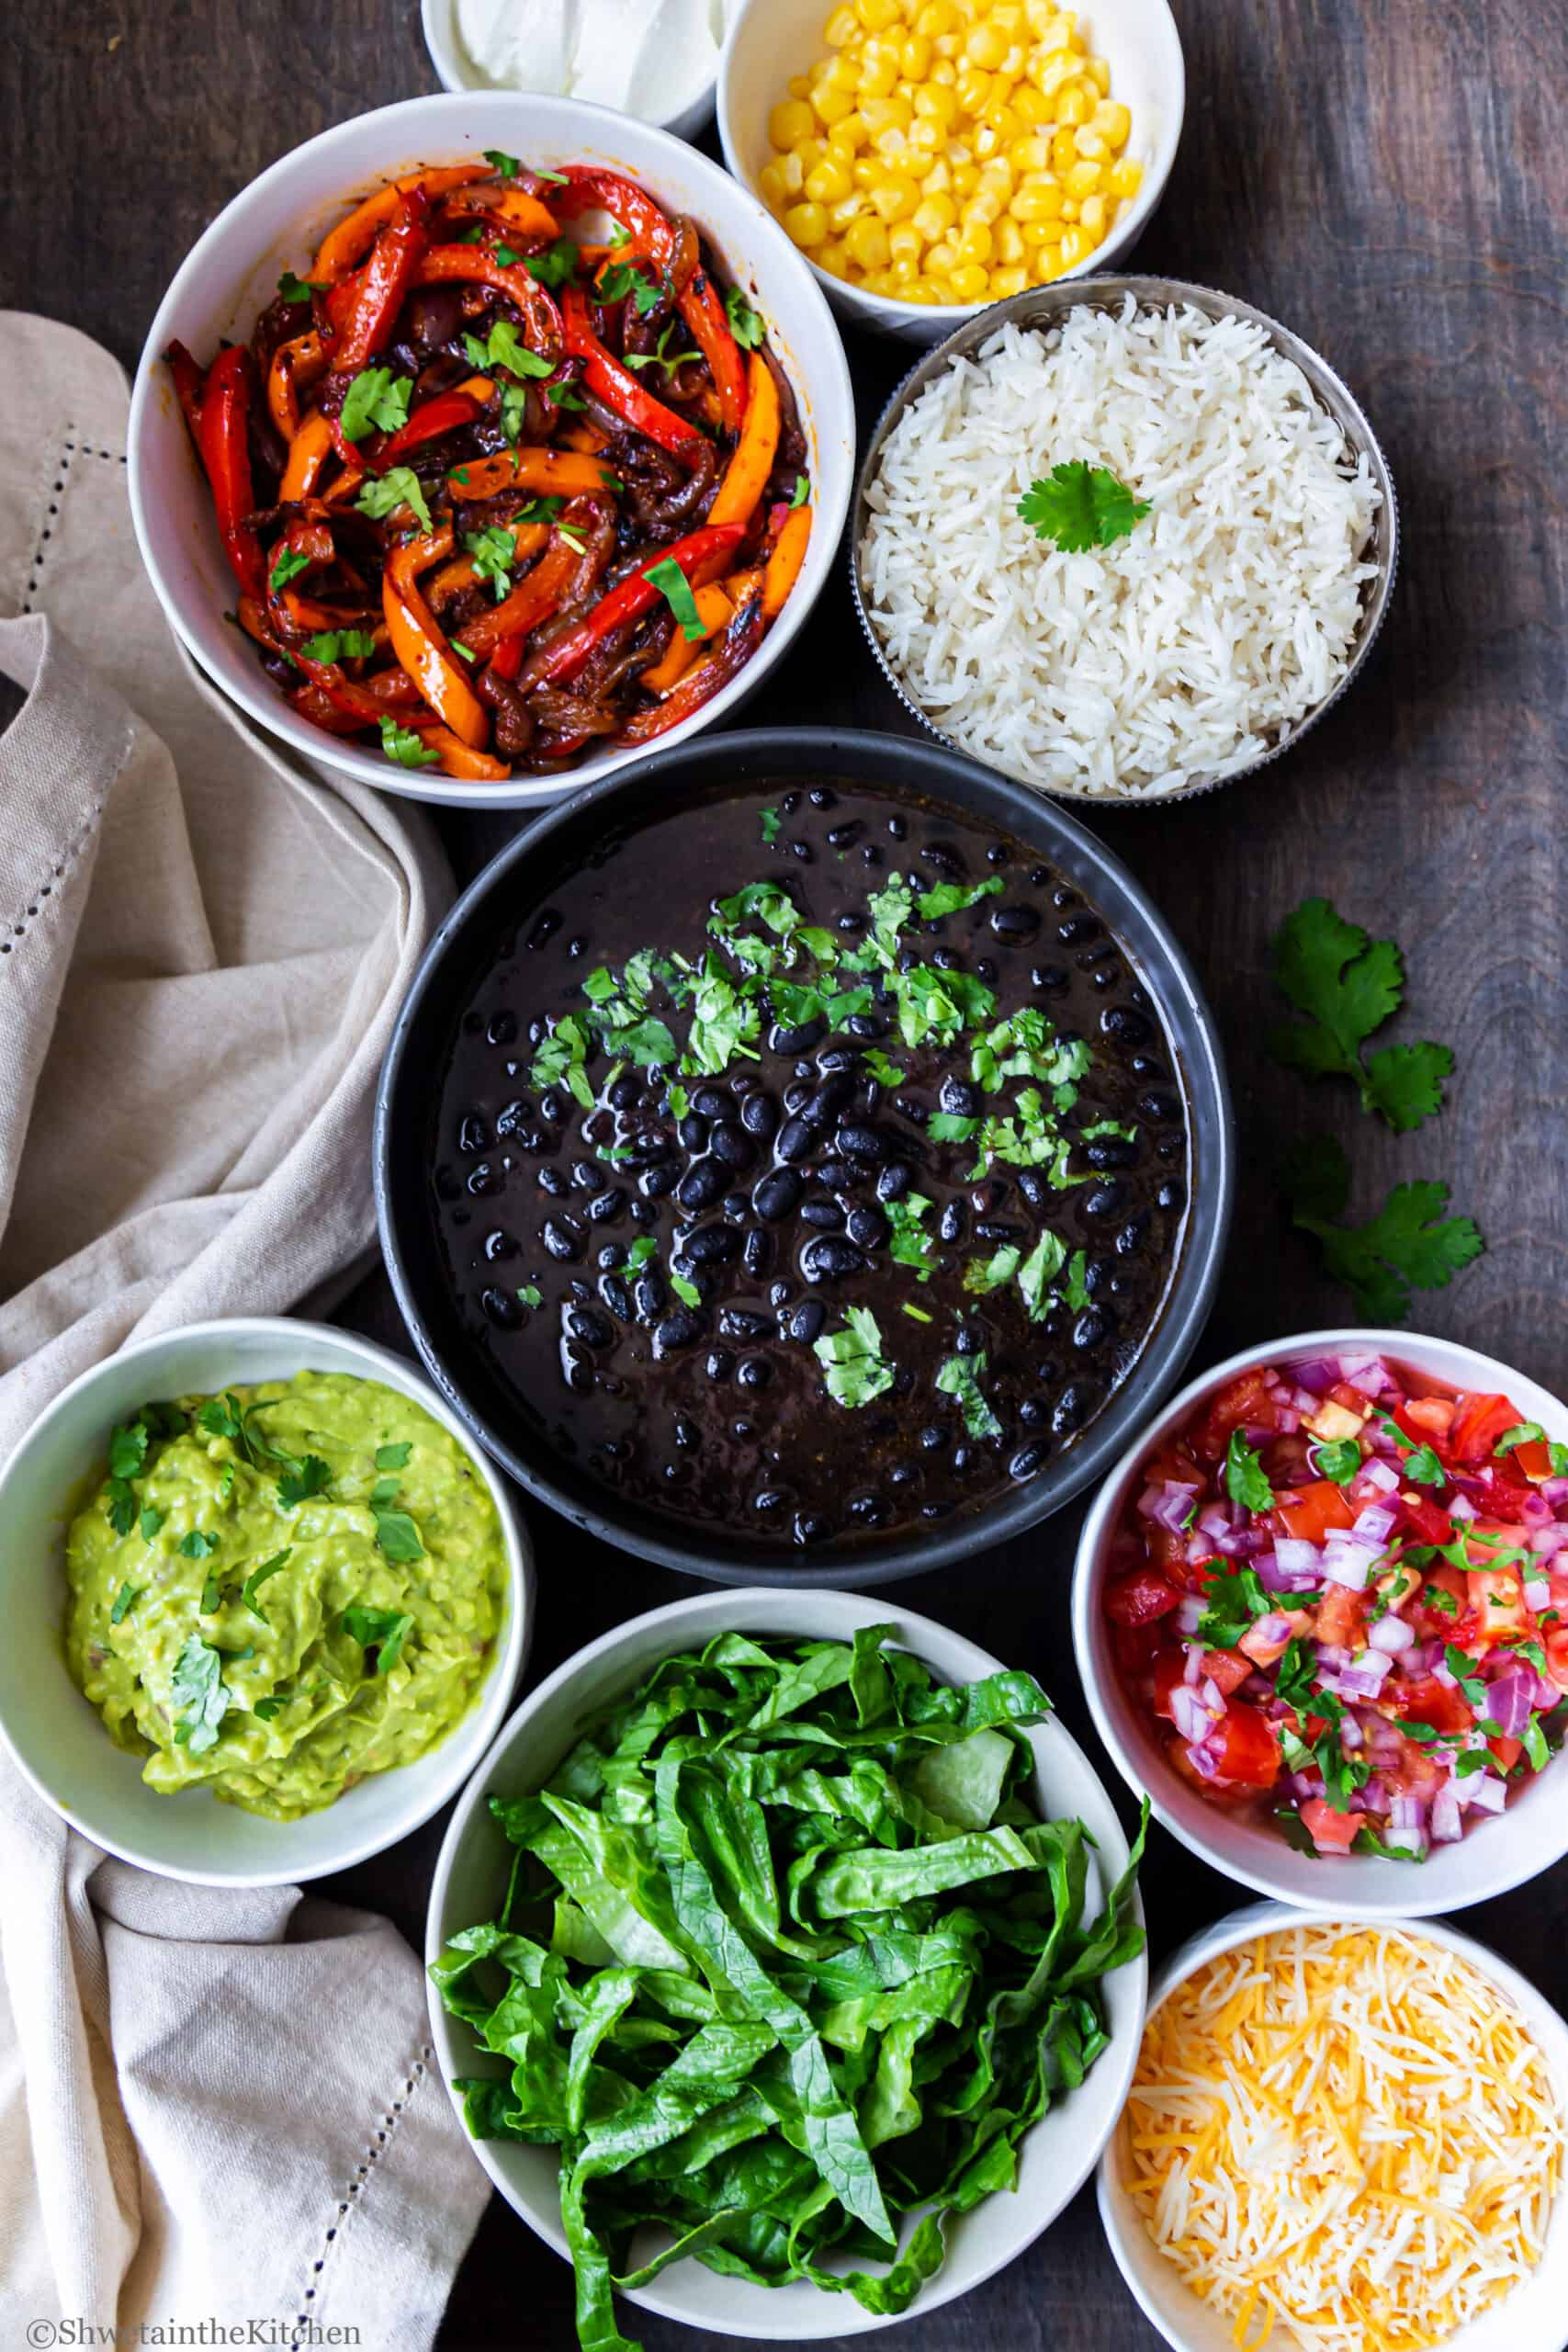 All the fixins for Veg burrito bowl